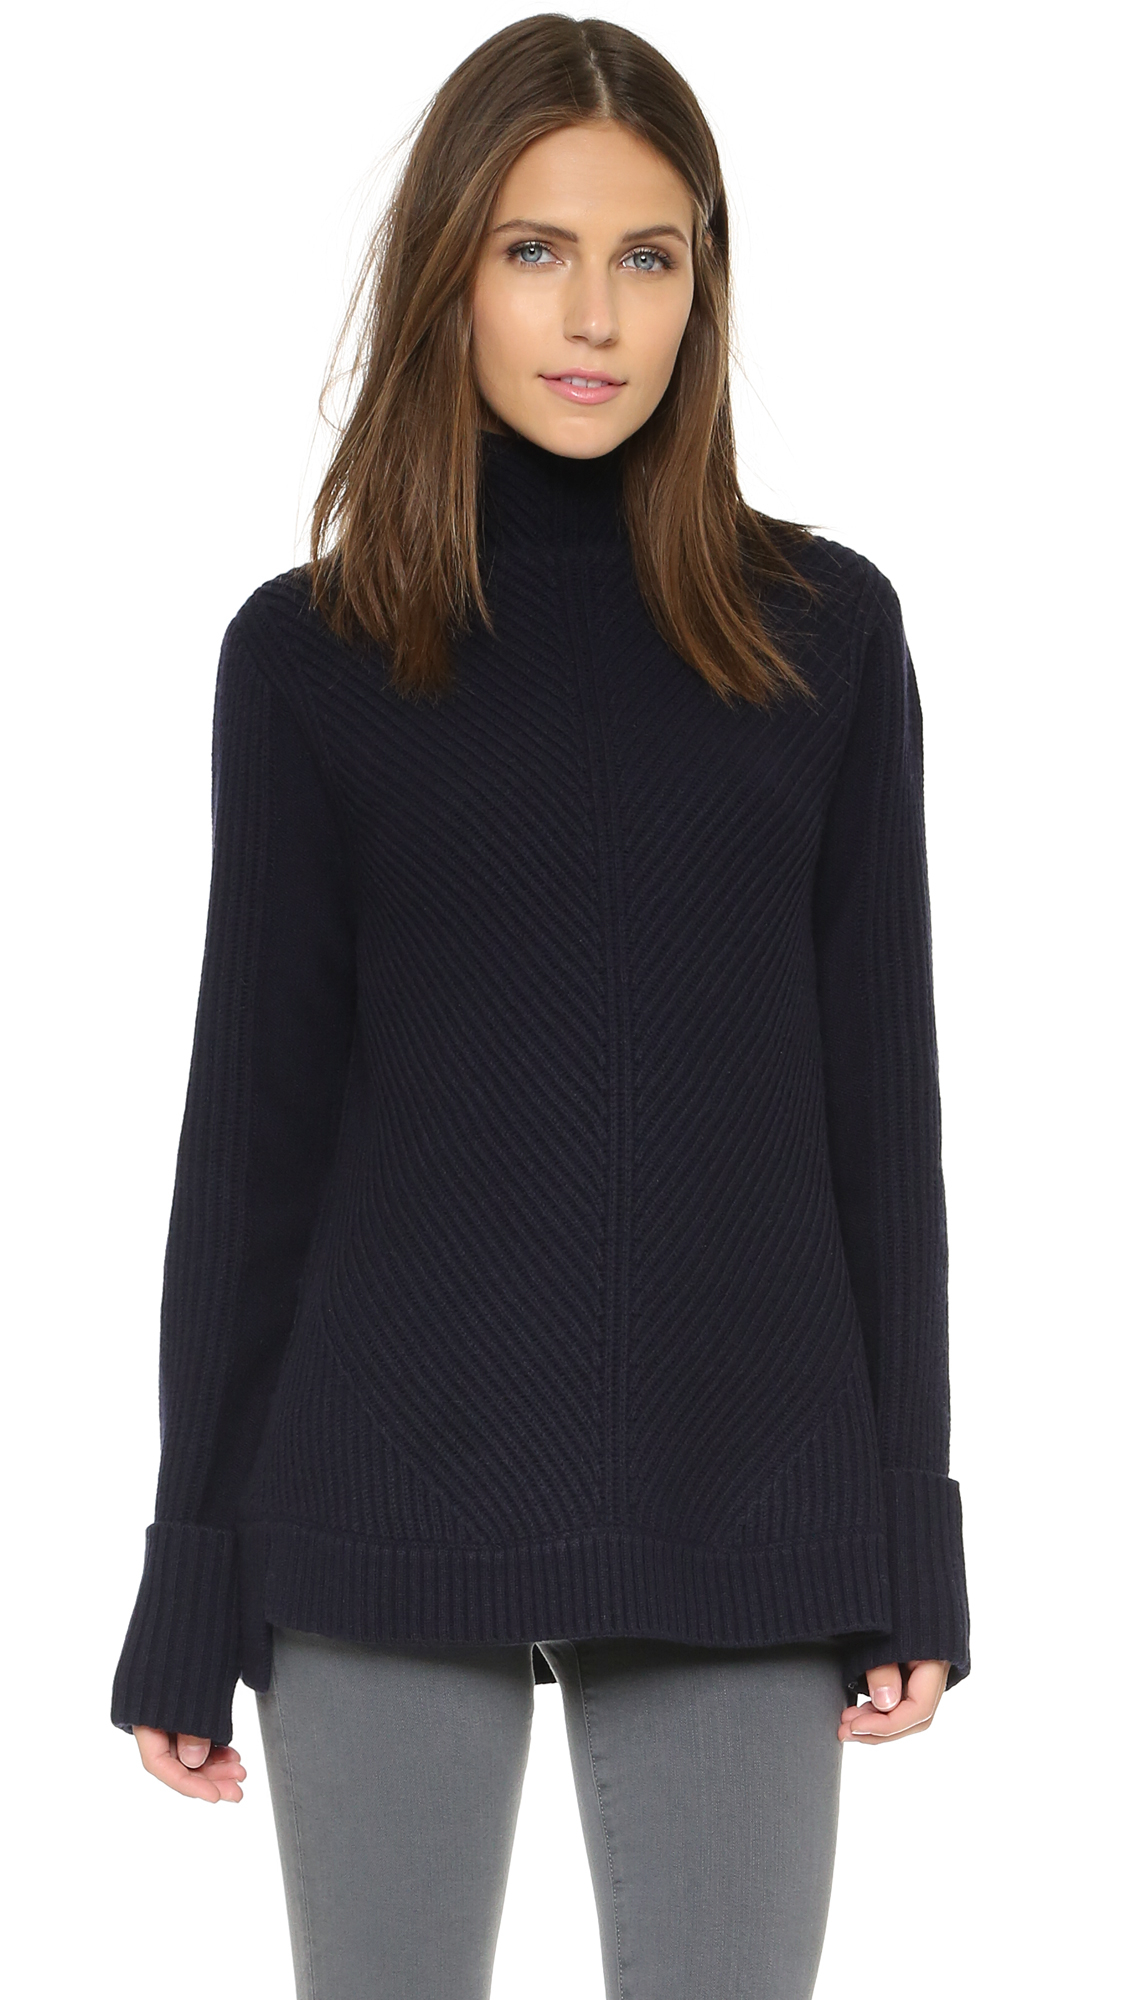 Vince Directional Rib Turtleneck Sweater - Coastal in Black | Lyst